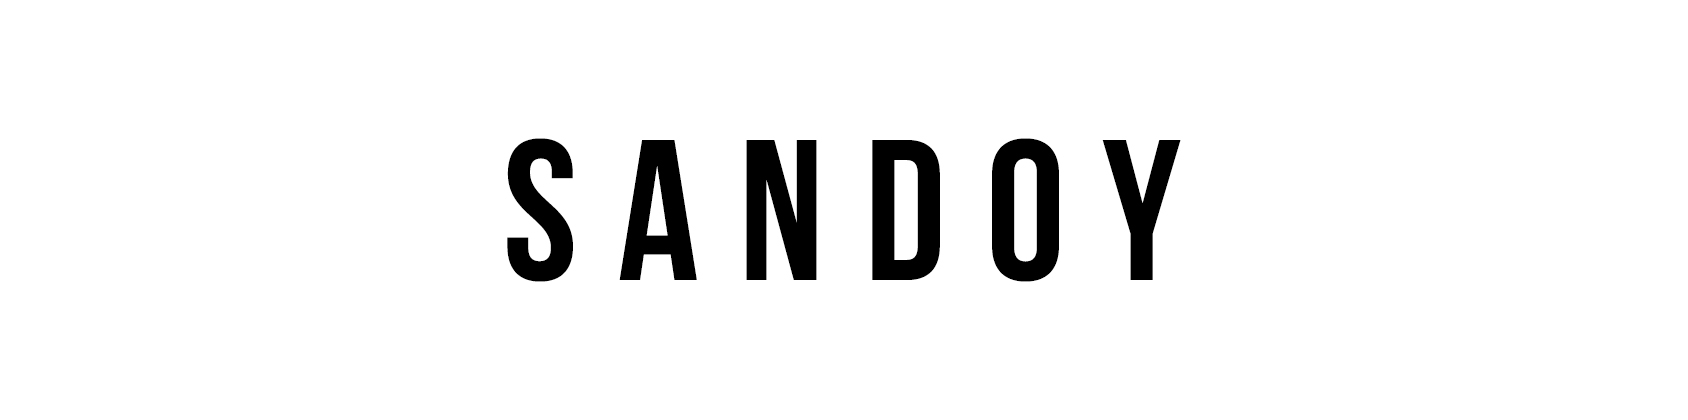 sandoy.jpg